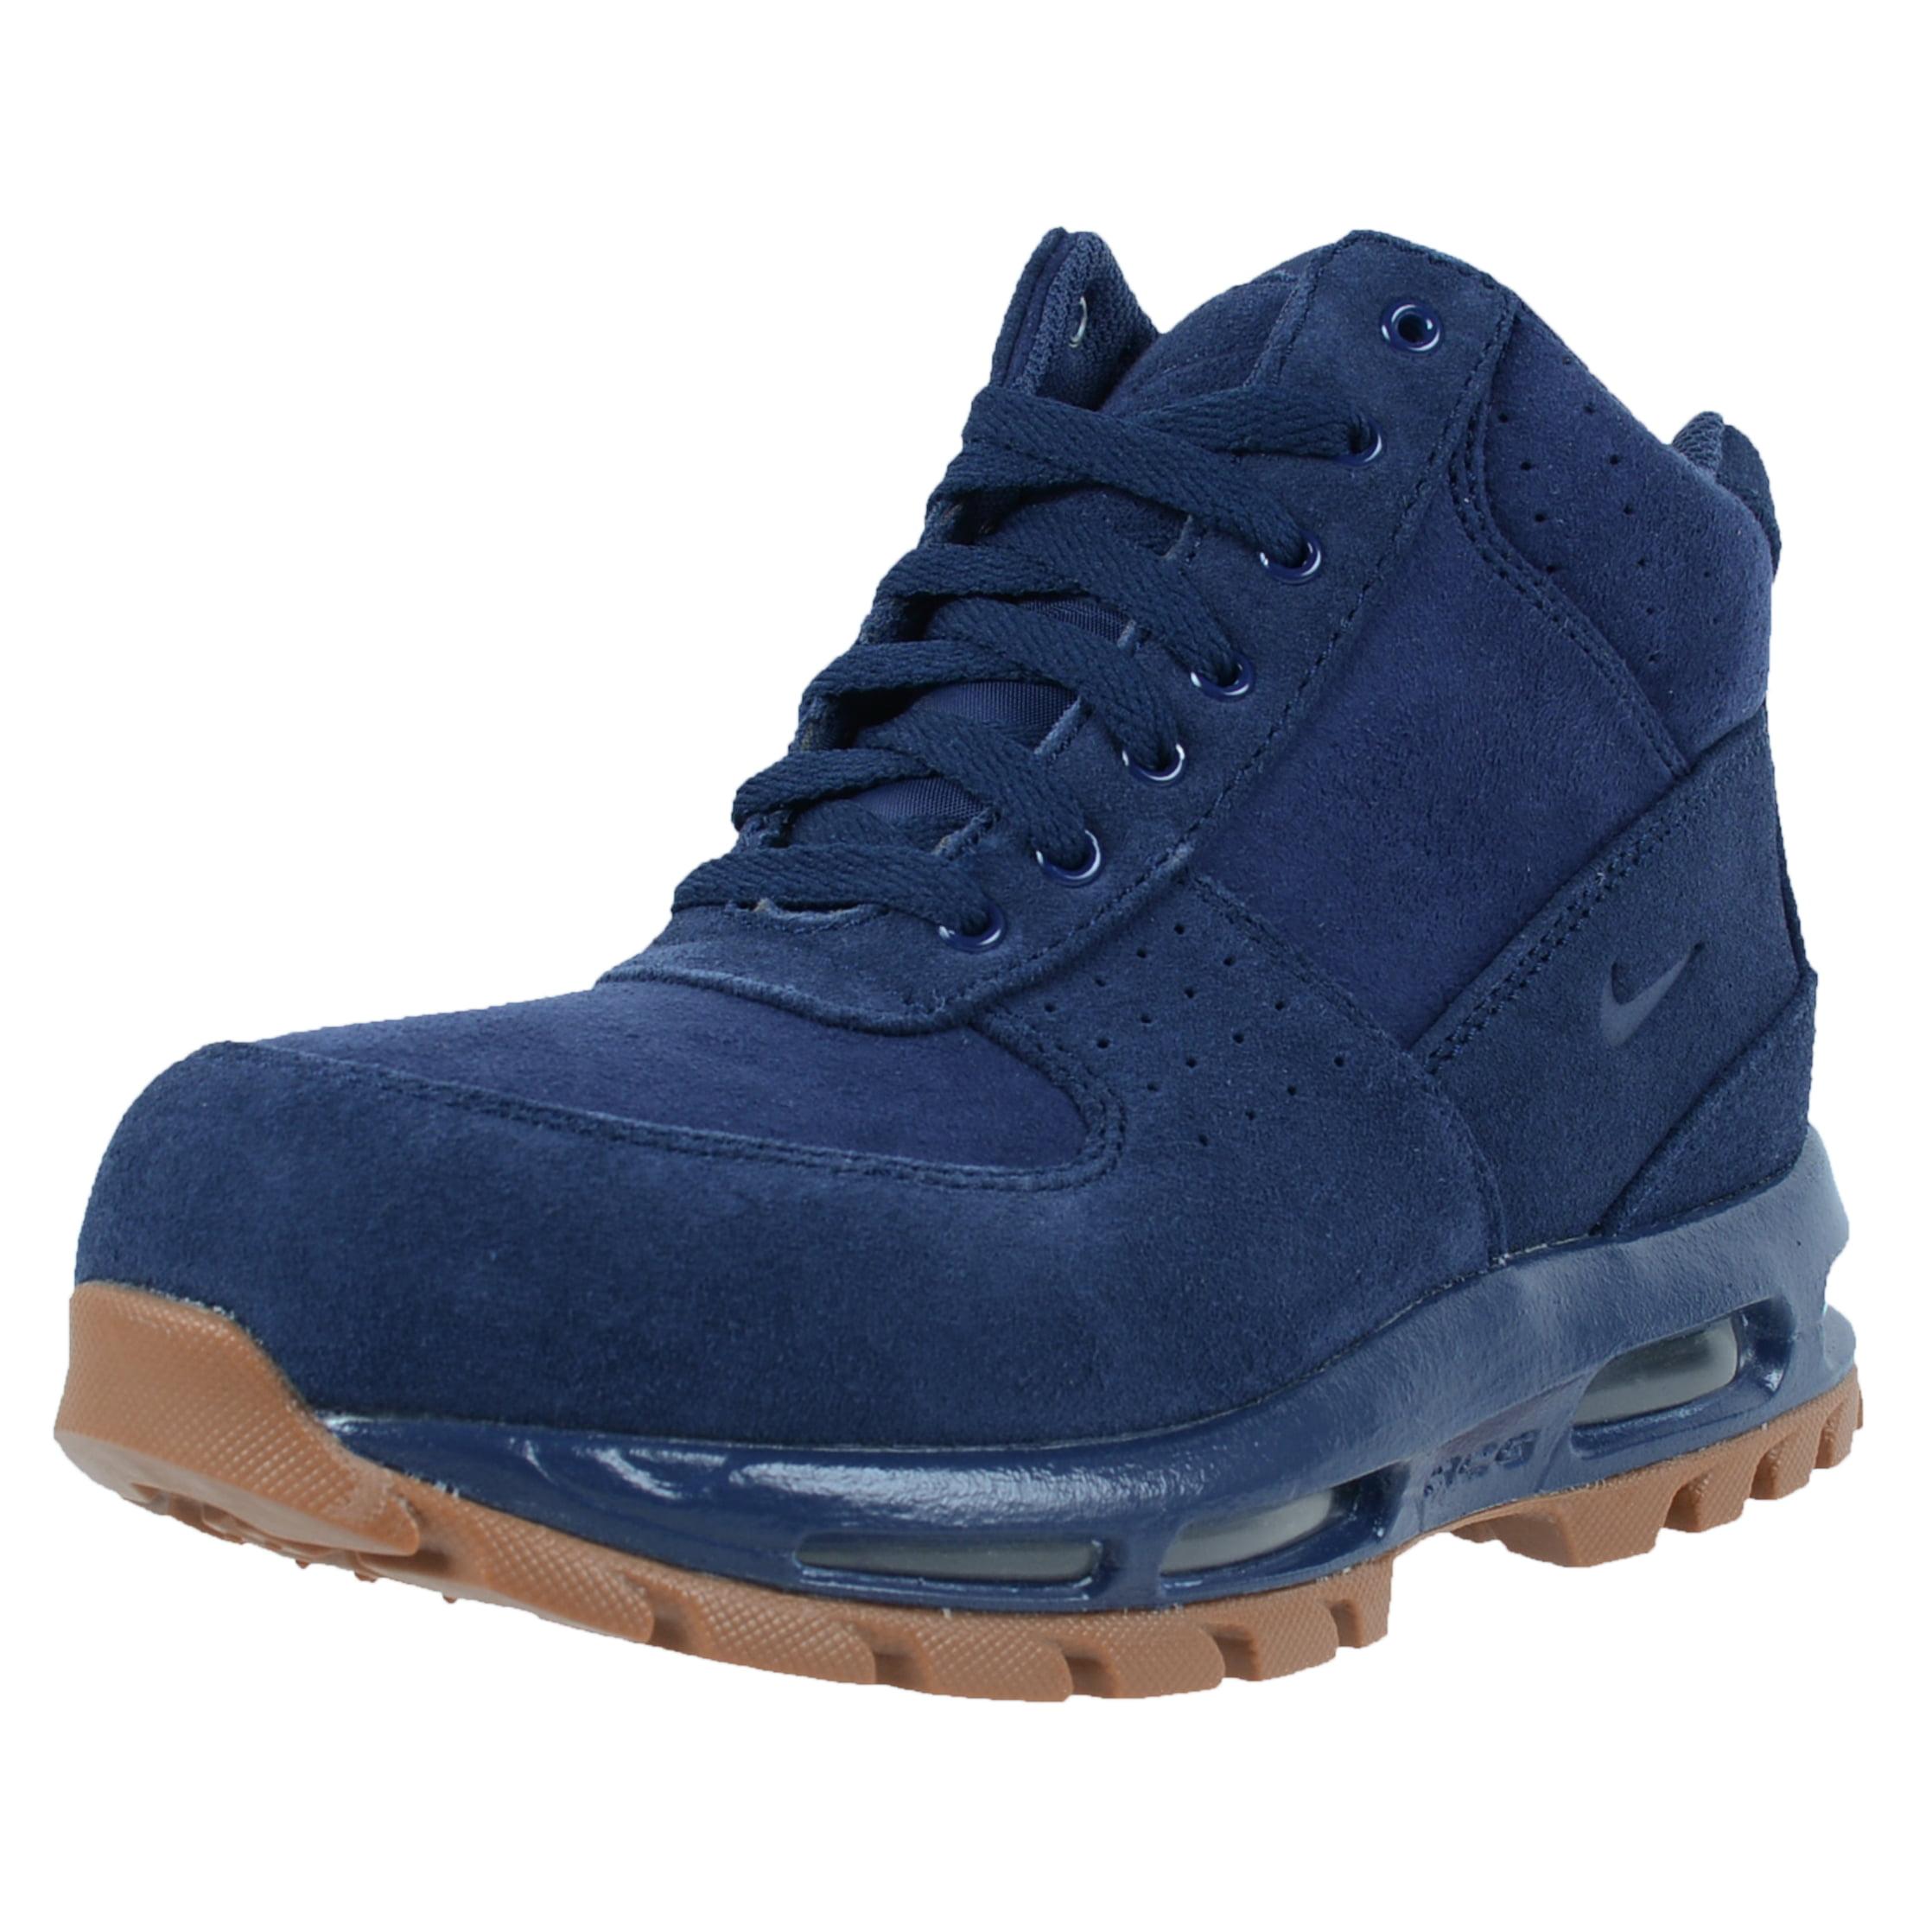 Nike Nike Air Max Goadome Gs Acg Midnight Navy Big Kids Boots